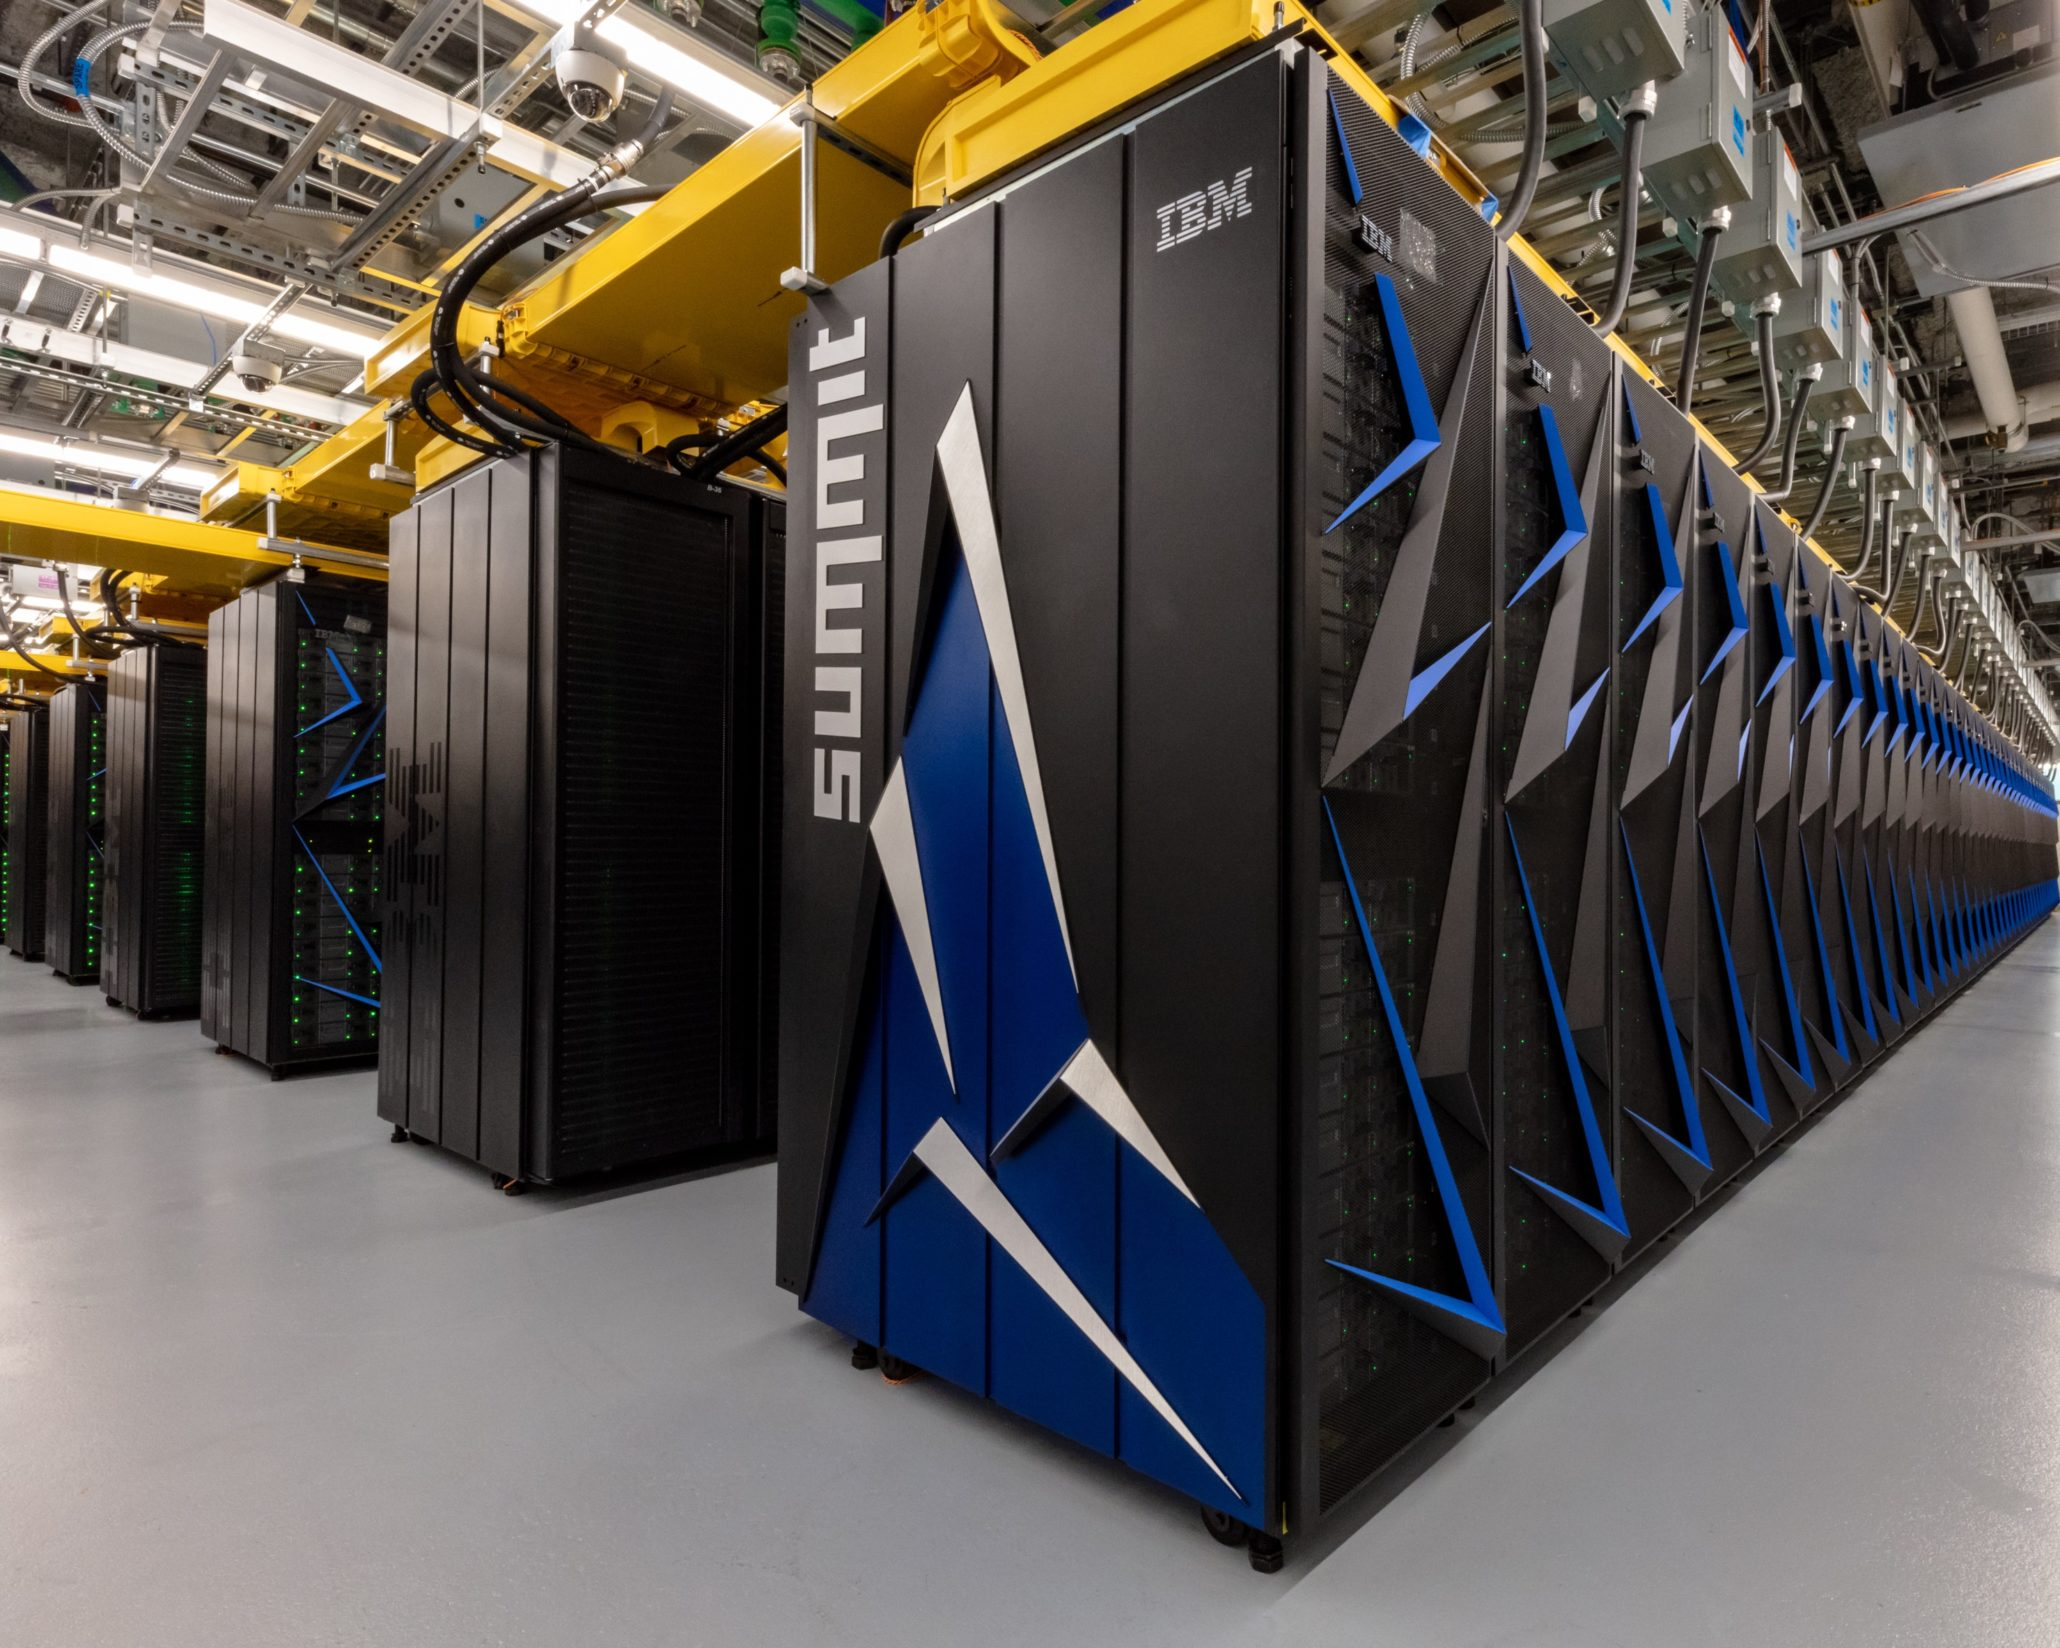 NVIDIA Summit Supercomputer